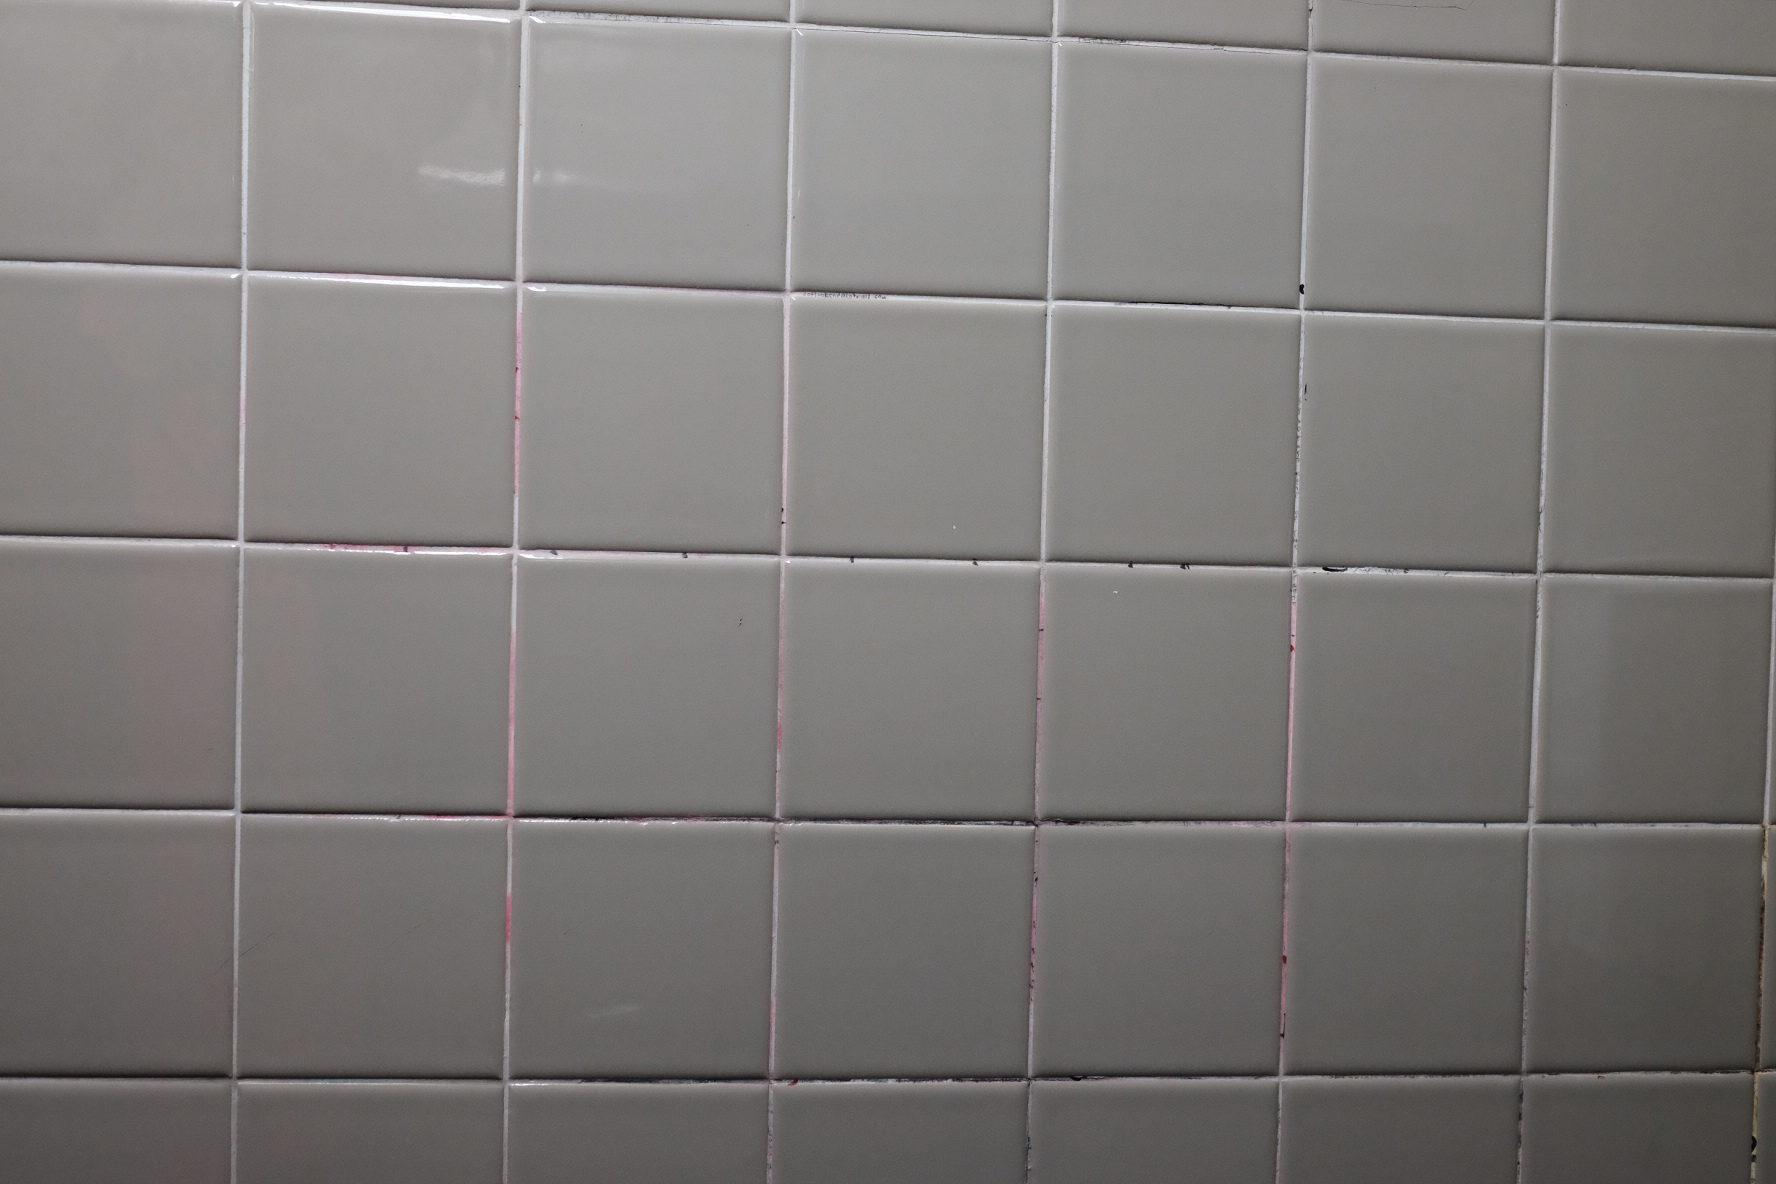 hate grafitti - cleaned